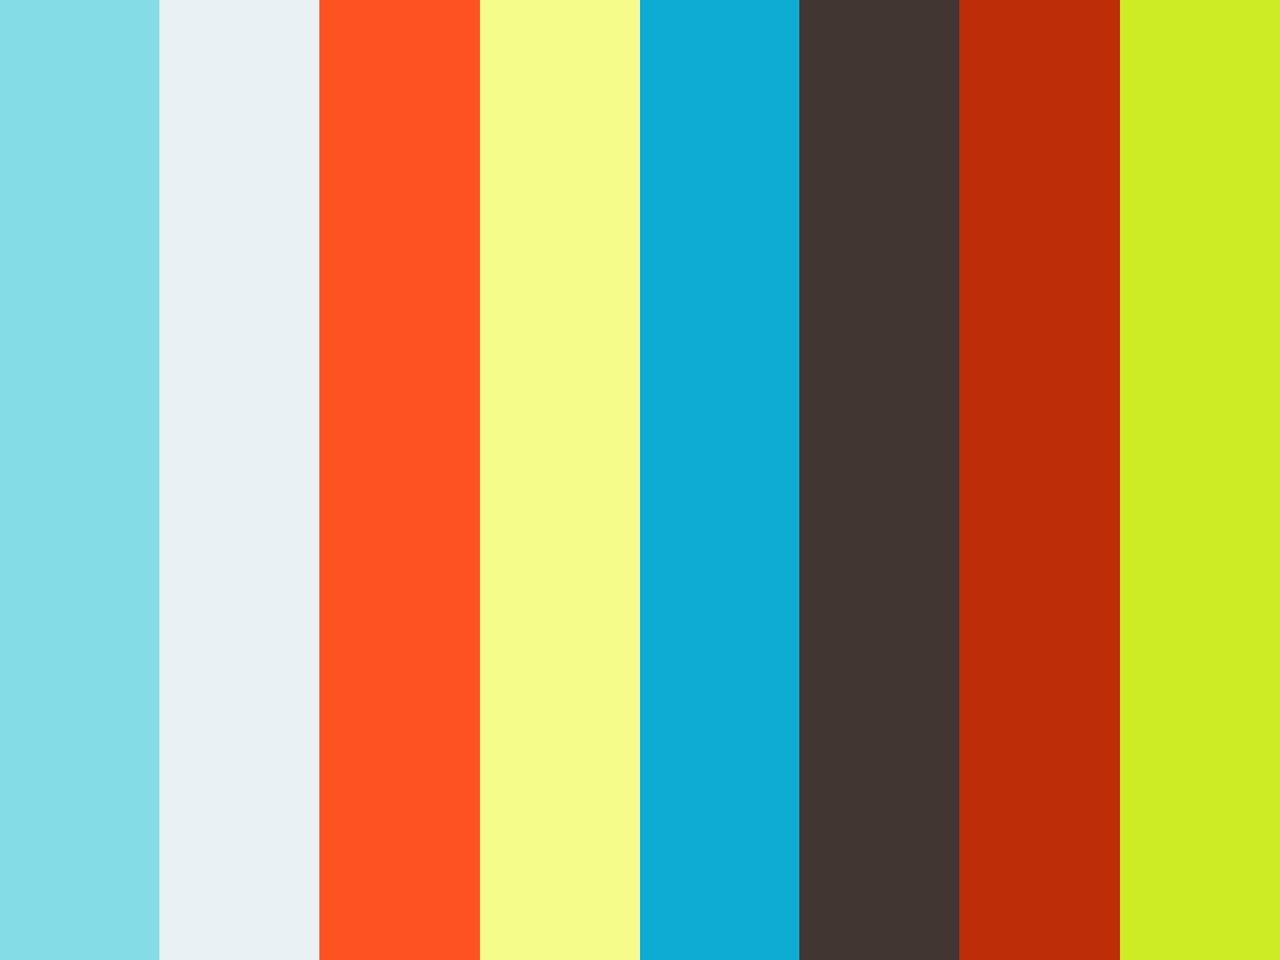 Programma Per Scaricare Musica Da Youtube Ubuntu